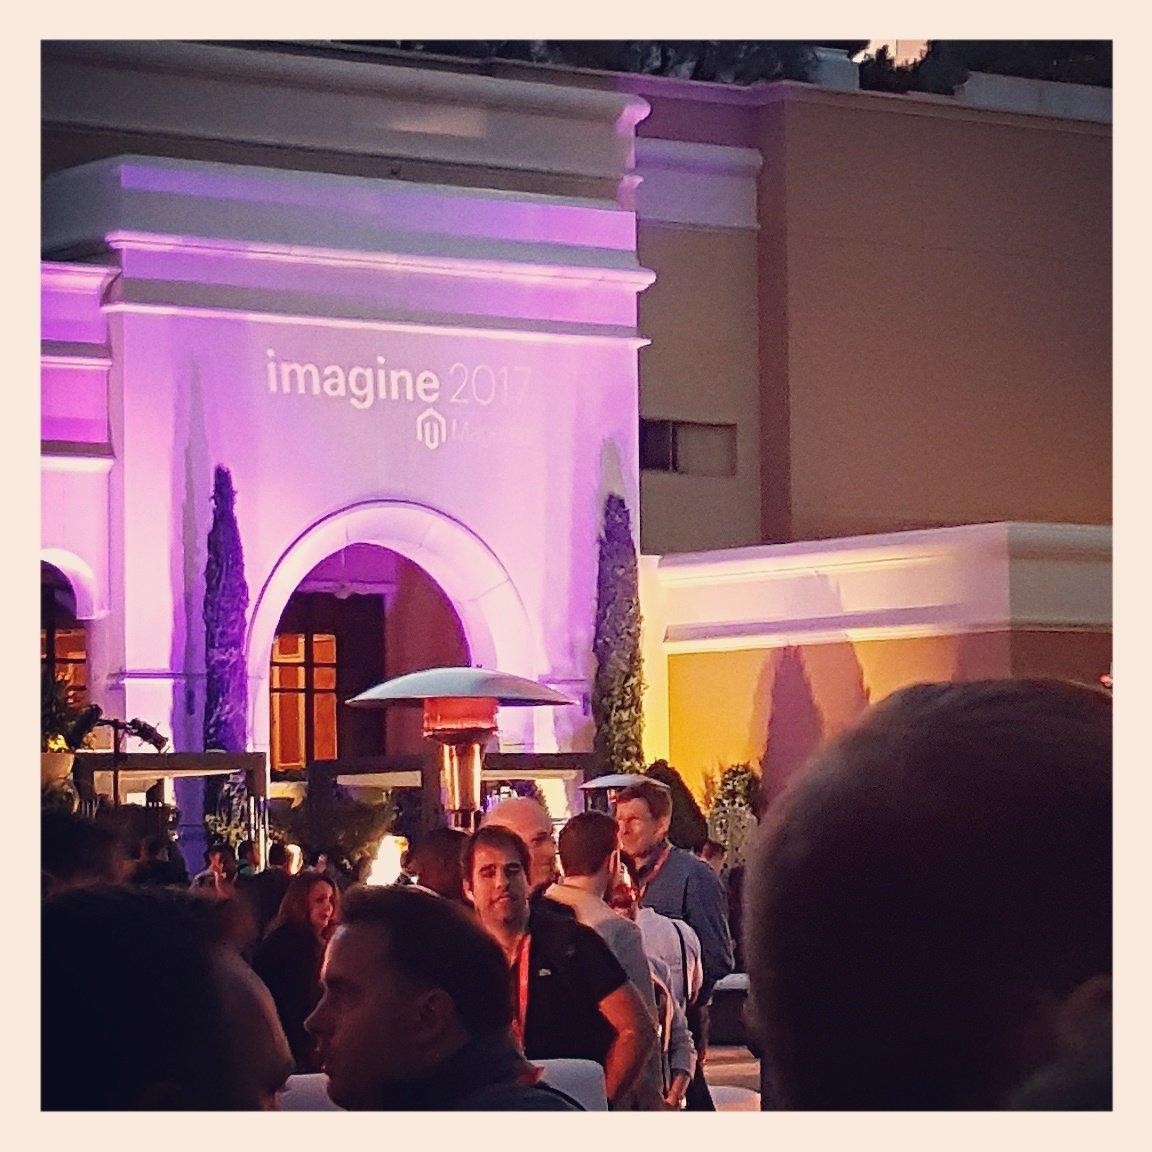 D_n_D: [Magento Imagine] Let's party! #Magentoimagine #Magento https://t.co/HFDkcoUBIg